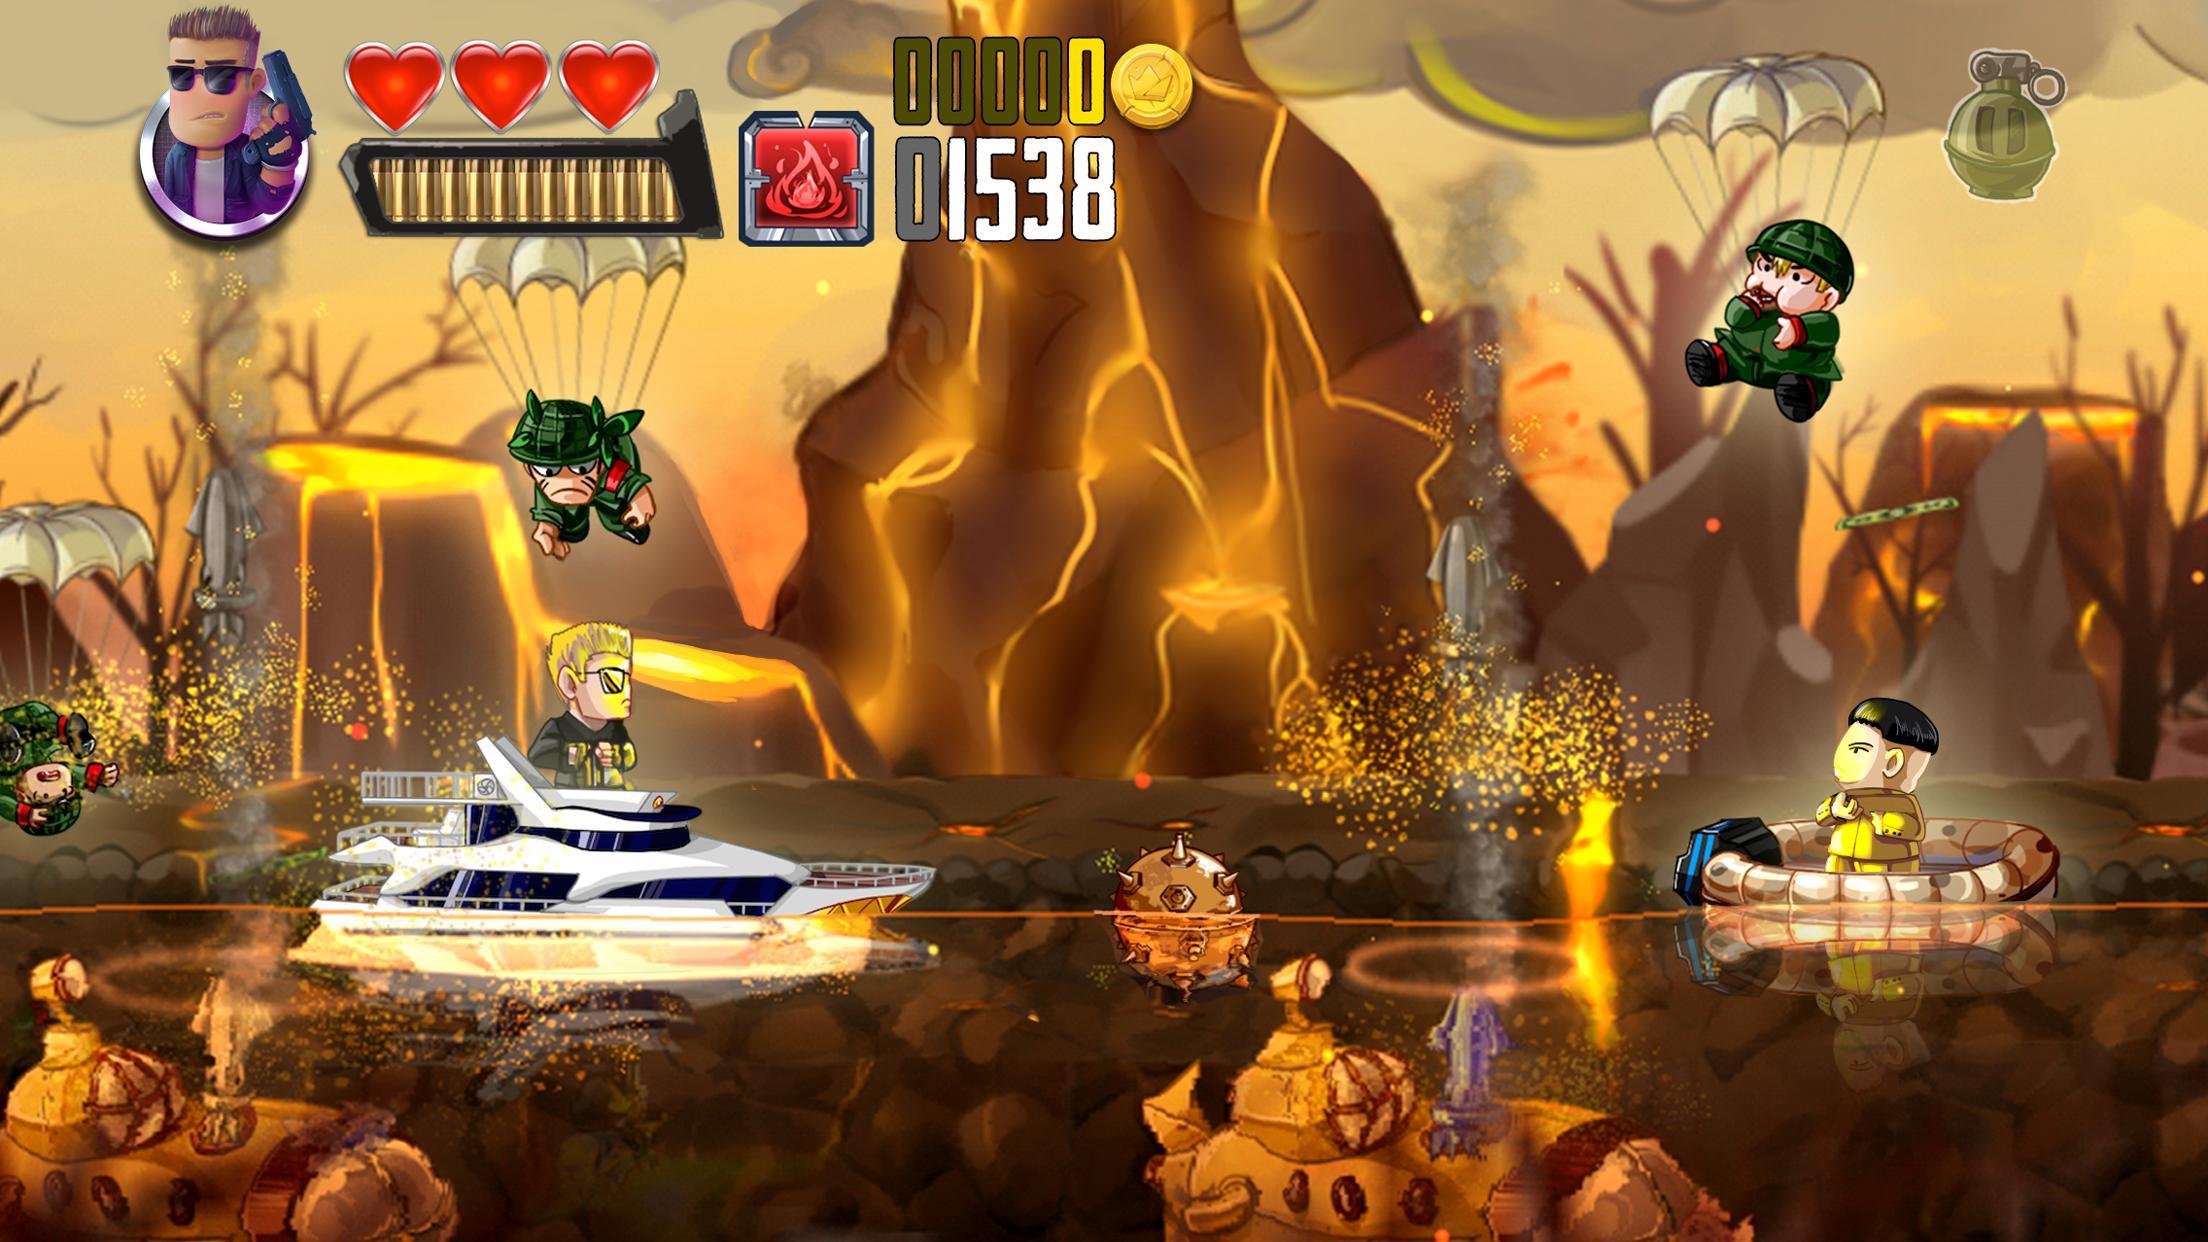 Ramboat Offline Jumping Shooter and Running Game 4.1.5 Screenshot 8